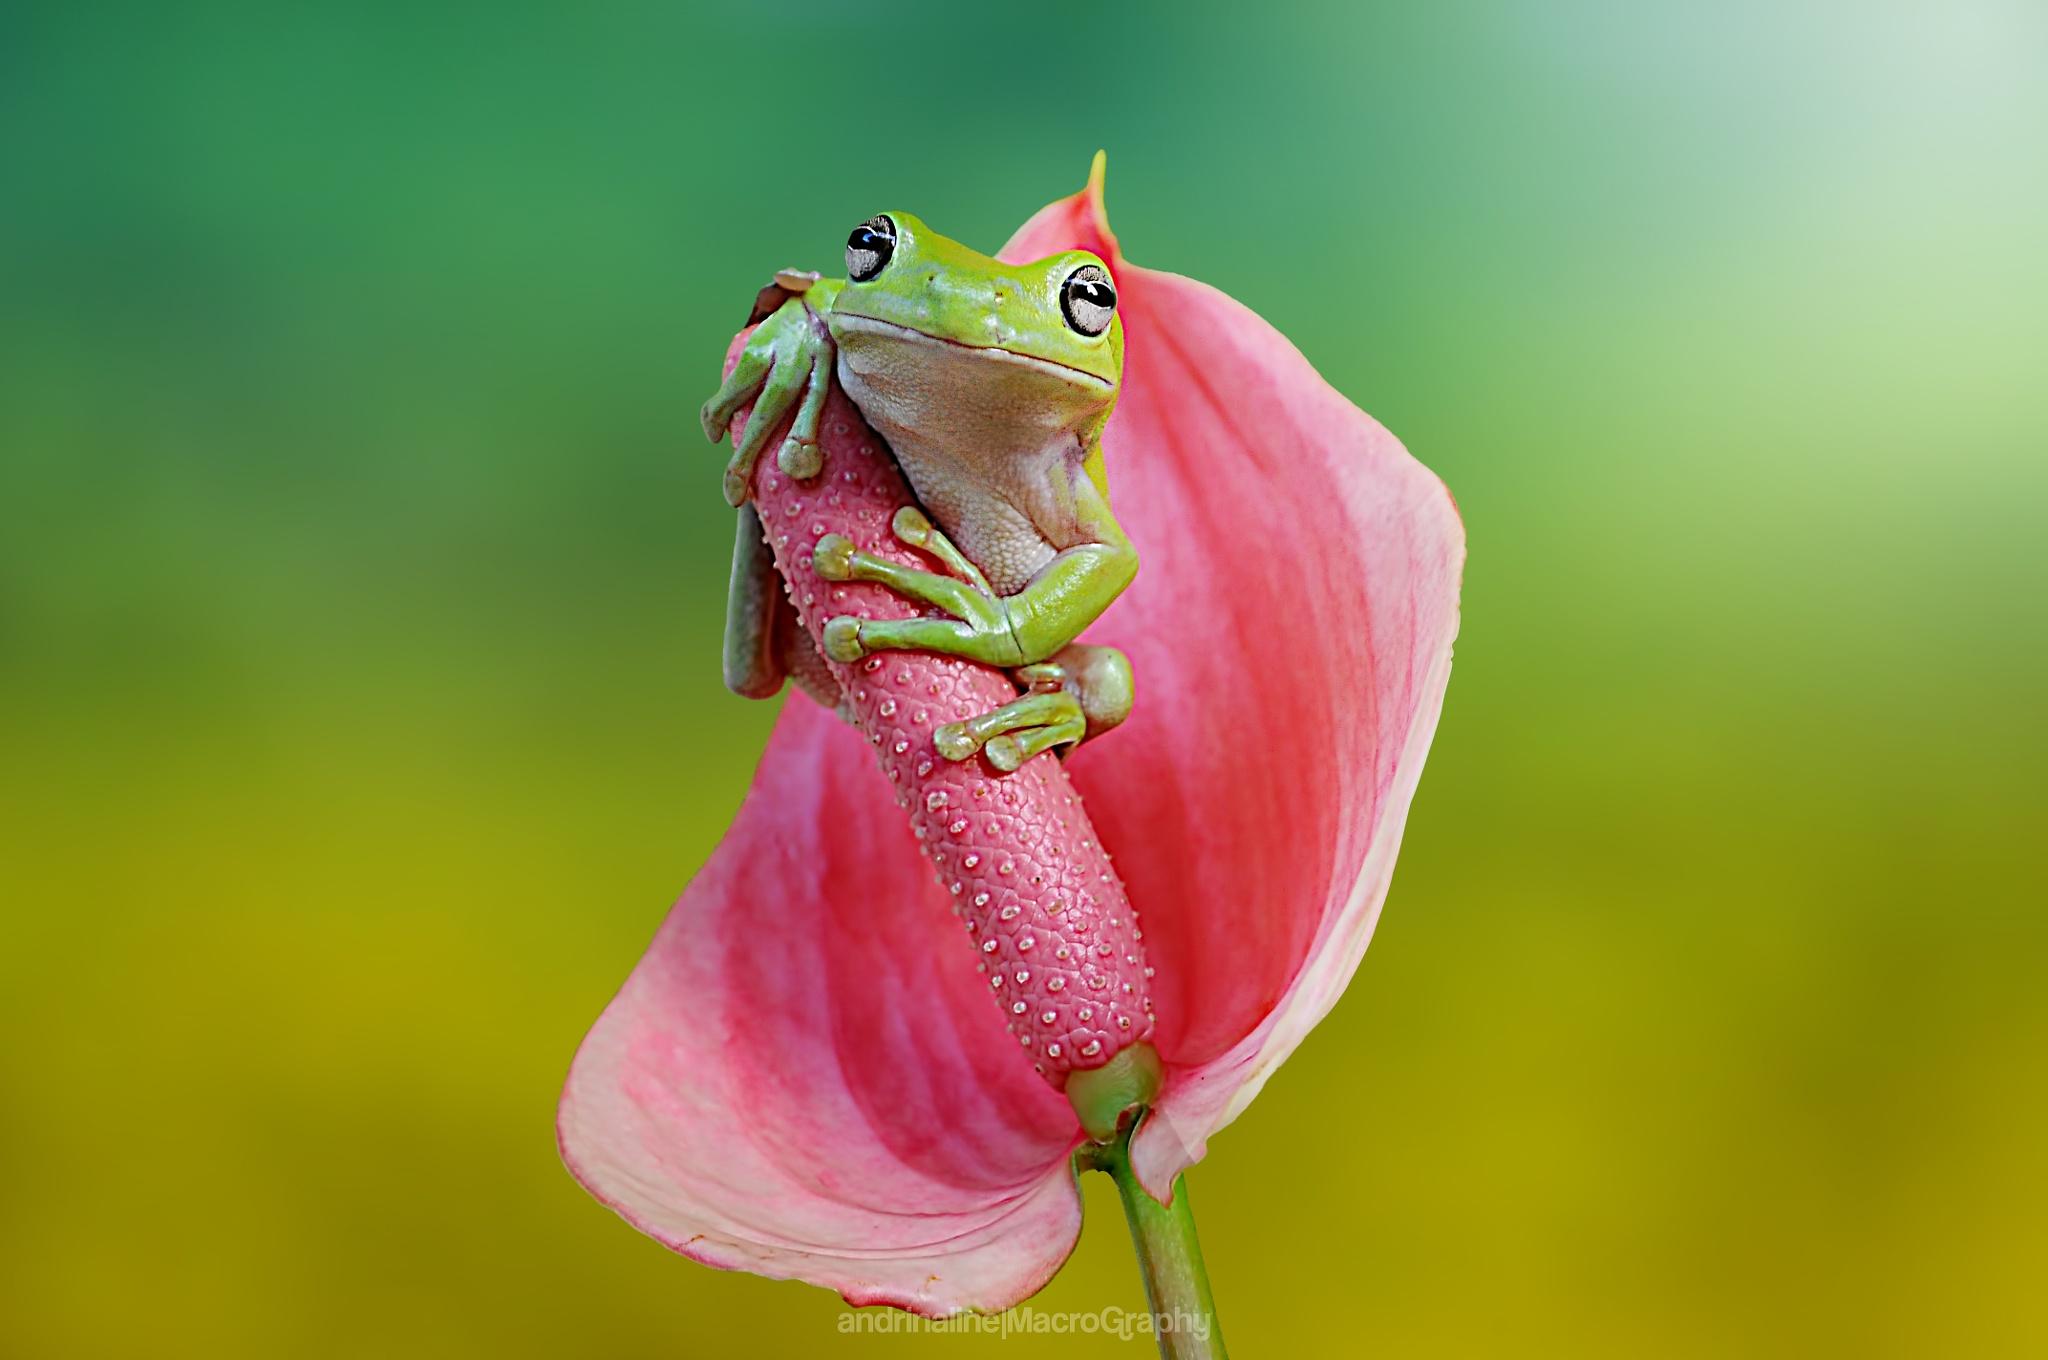 dumpy frog by Andri Priyadi